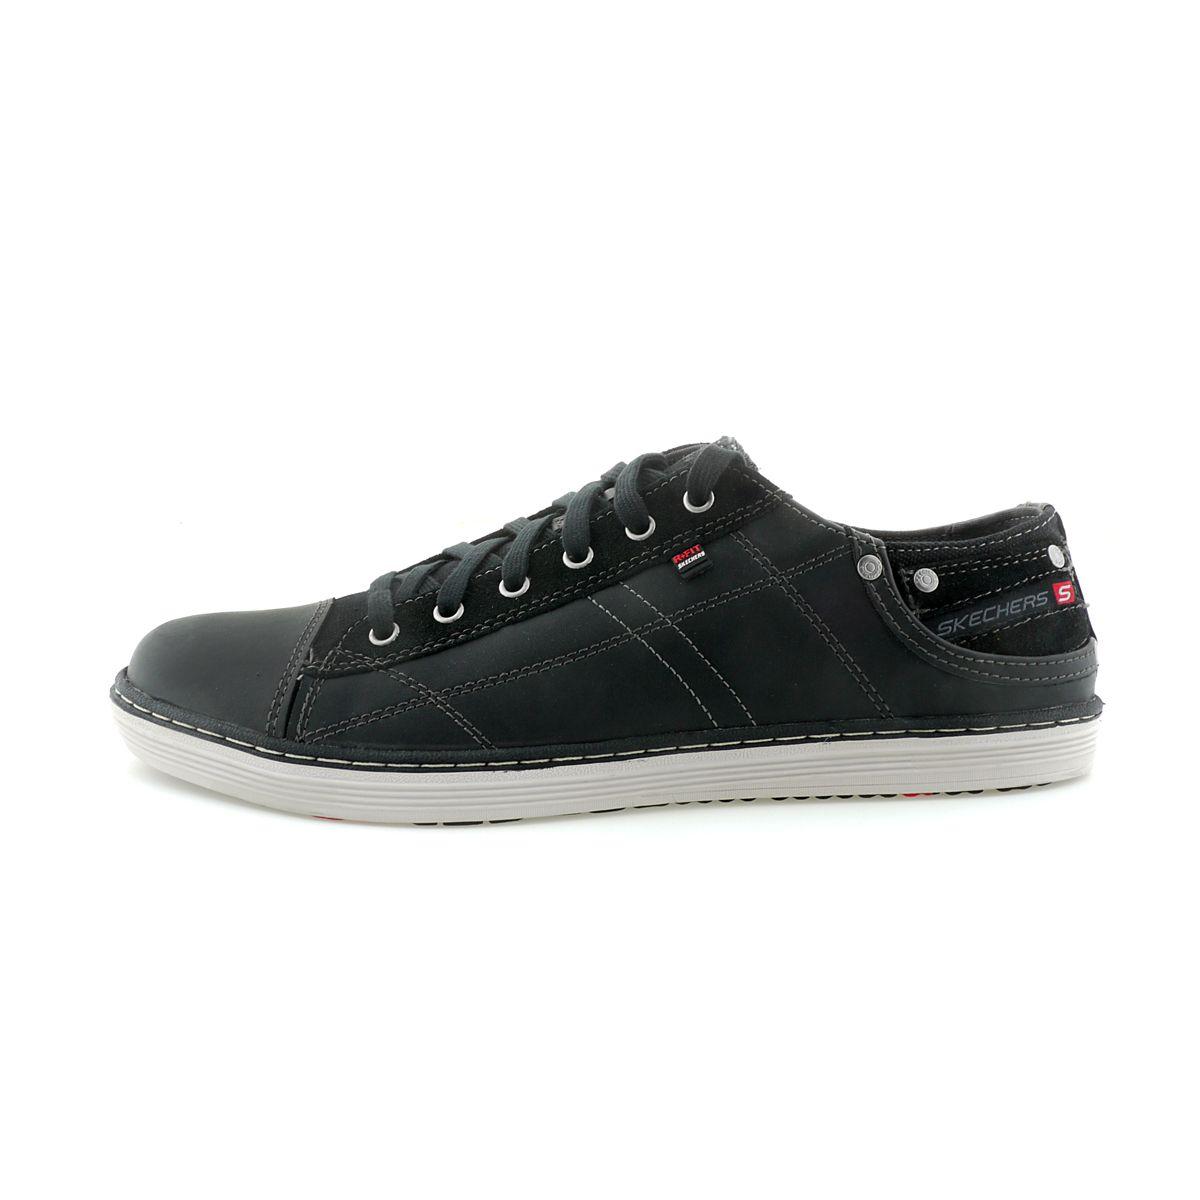 chaussures sorino noires grande taille du 47 5 au 48 5 size factory skechers. Black Bedroom Furniture Sets. Home Design Ideas